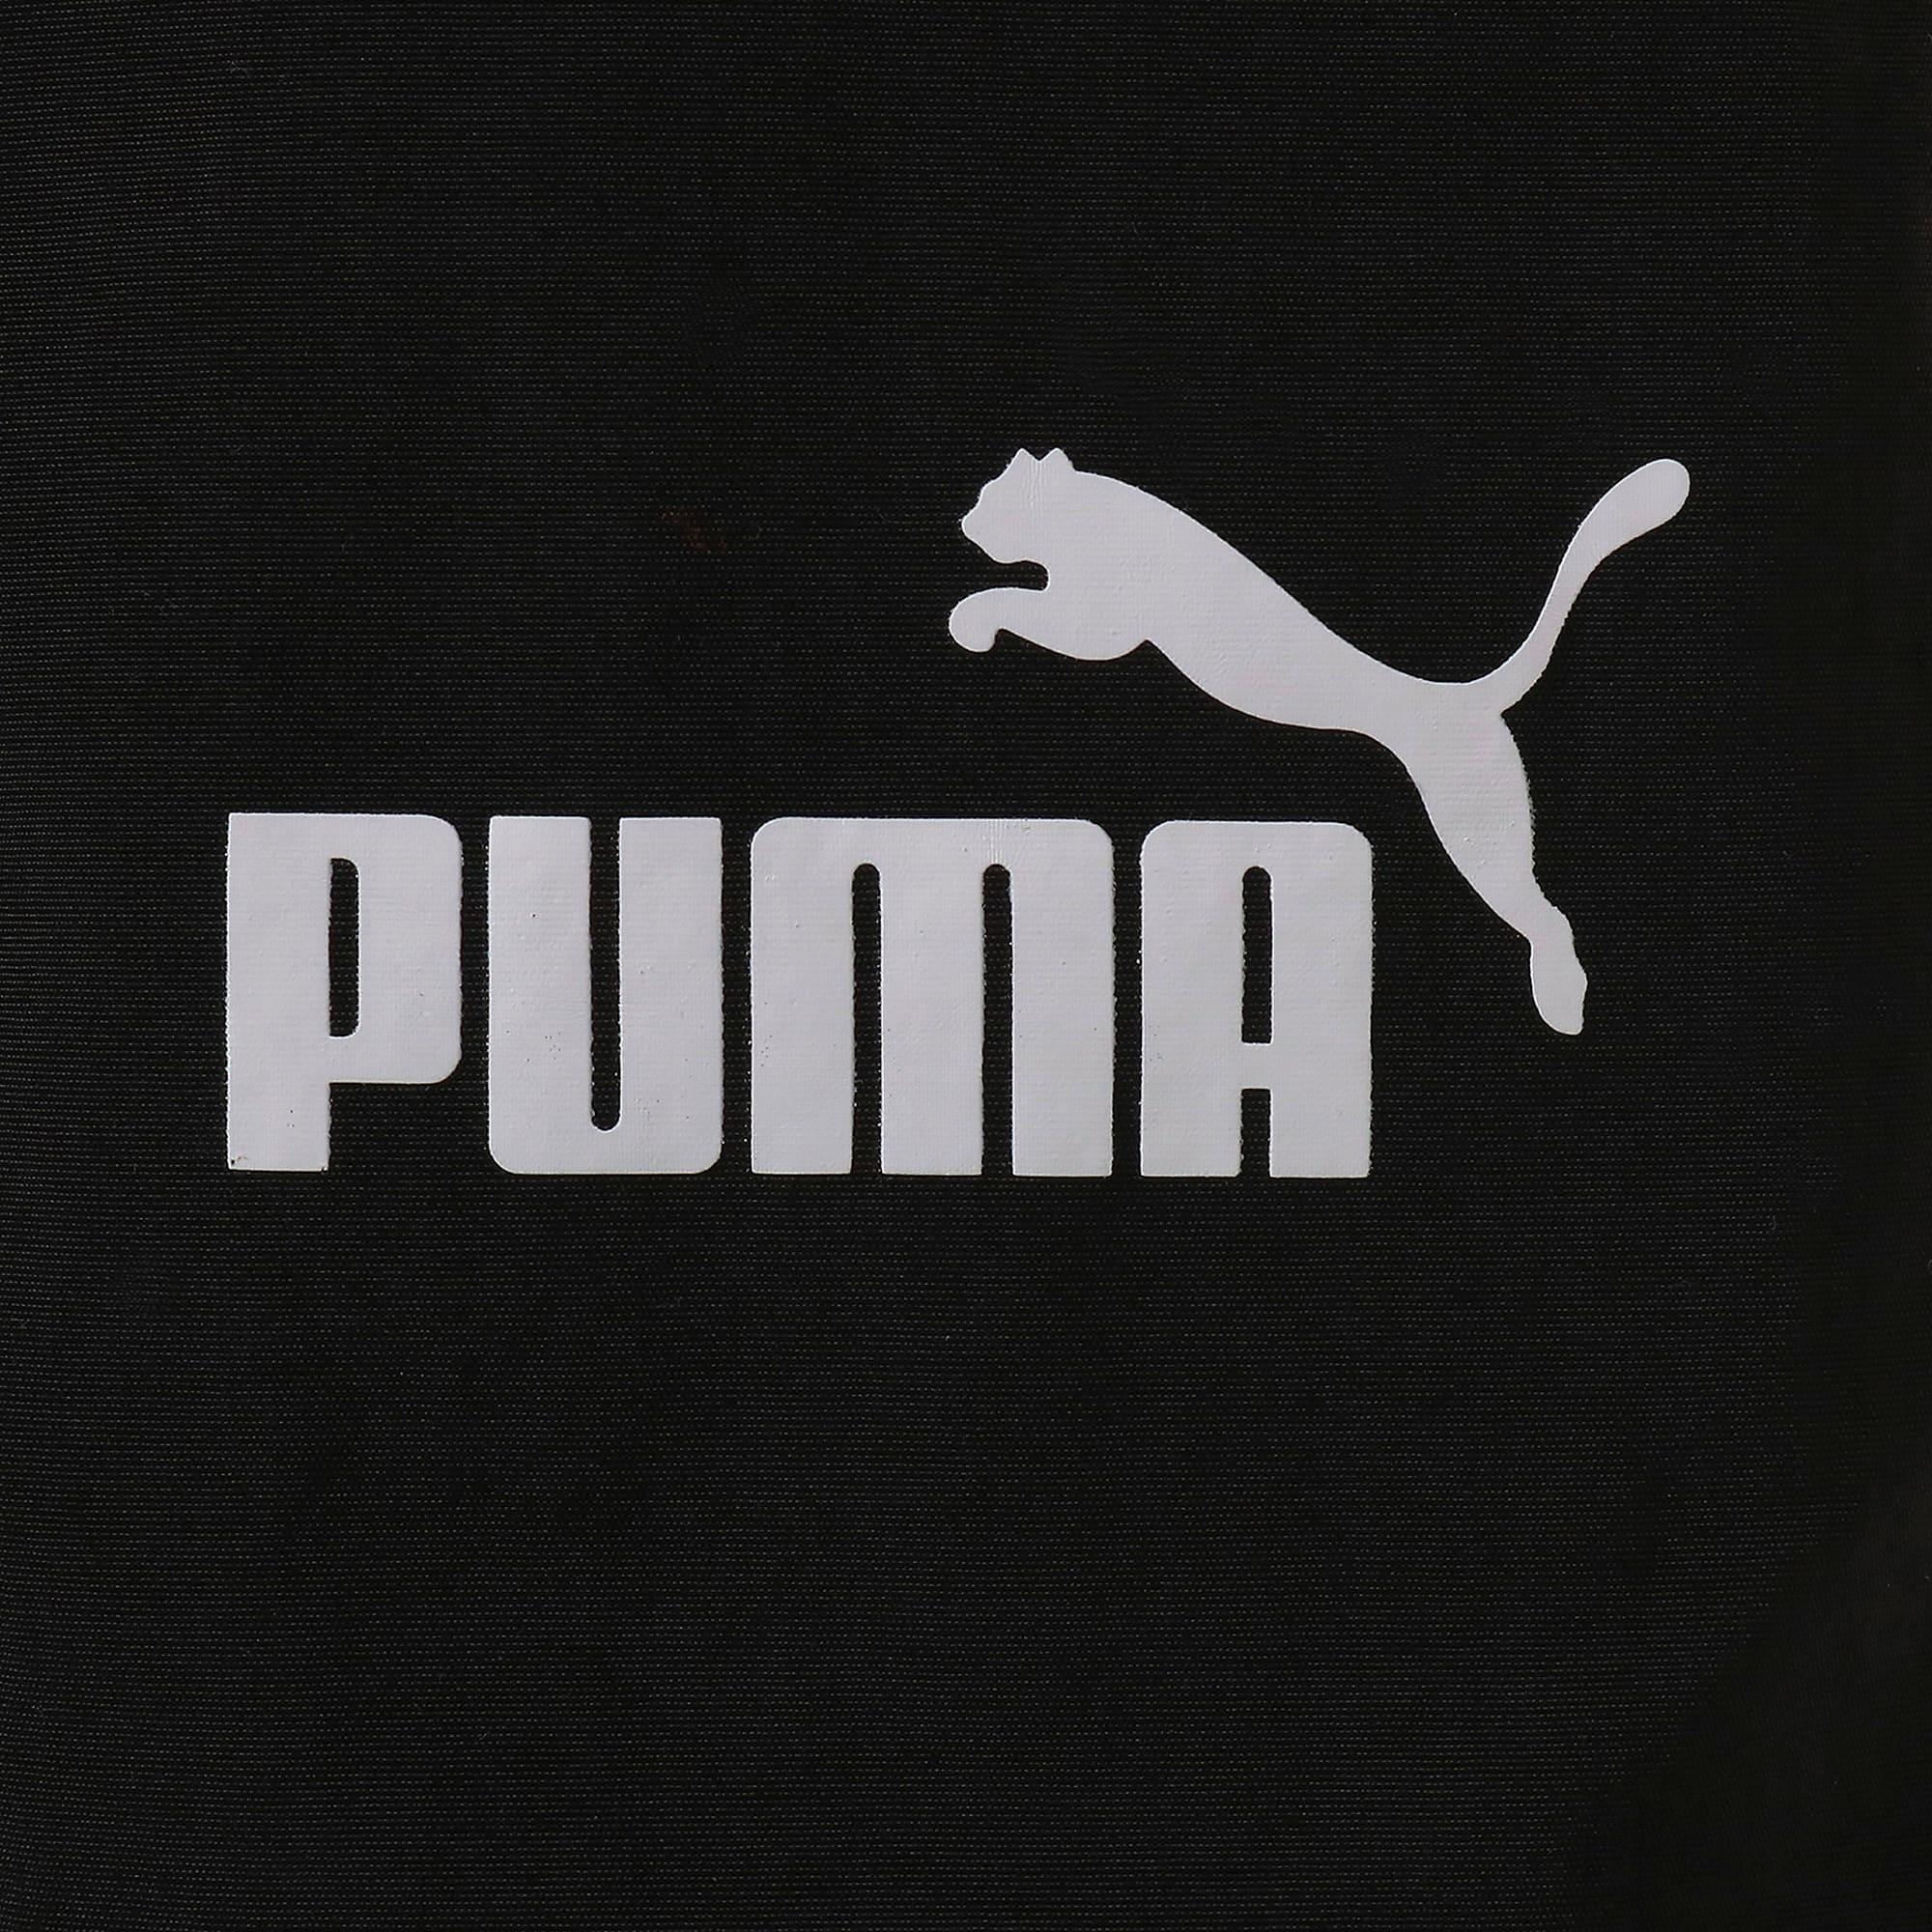 Thumbnail 4 of キッズ ナイロン カプリパンツ, Puma Black, medium-JPN